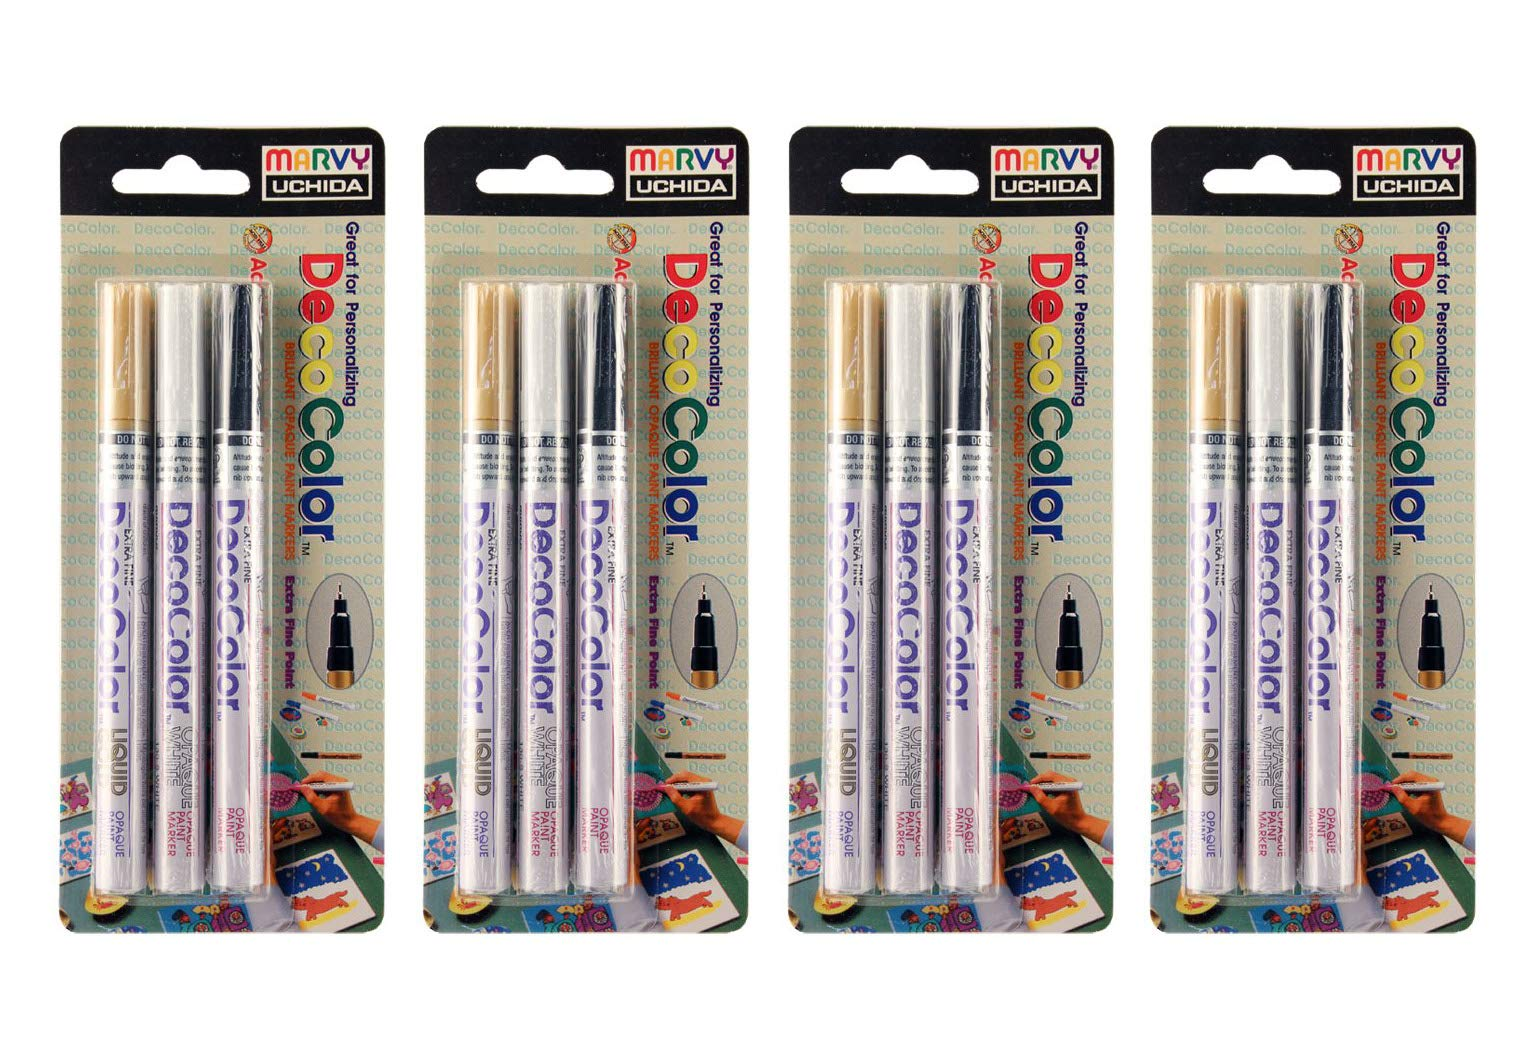 UCHIDA Deco Color Extra Fine Tip Paint Marker Set (Fоur Расk) by UCHIDA